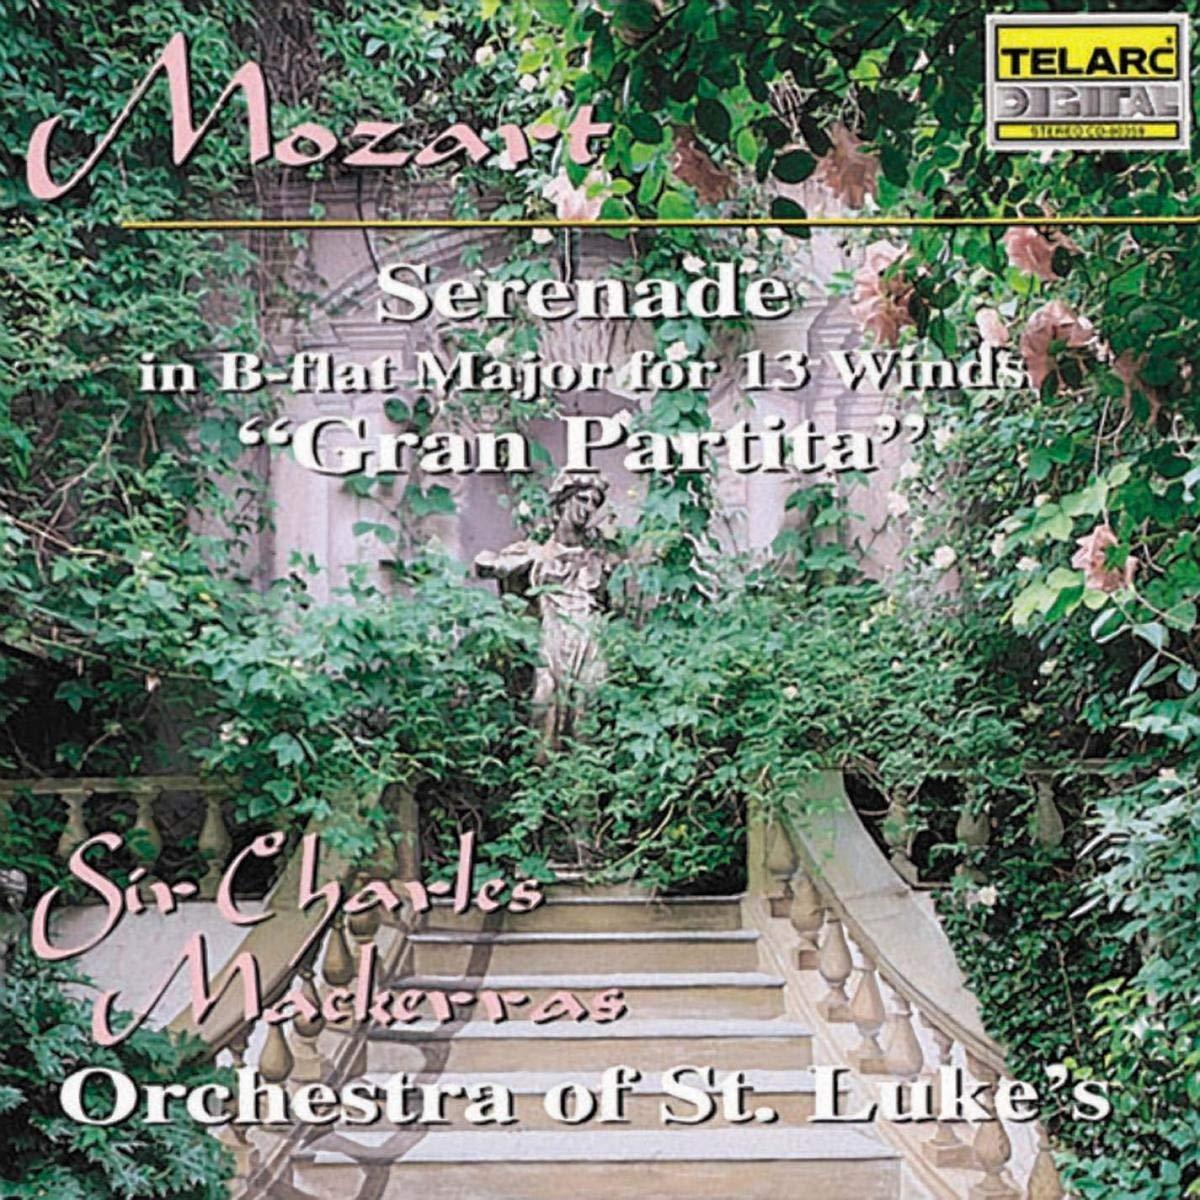 "Wolfgang Amadeus Mozart, Charles Mackerras, Members of the Orchestra of St.  Luke's - Mozart: Serenade in B-flat Major for 13 Winds ""Gran Partita"" -  Amazon.com Music"